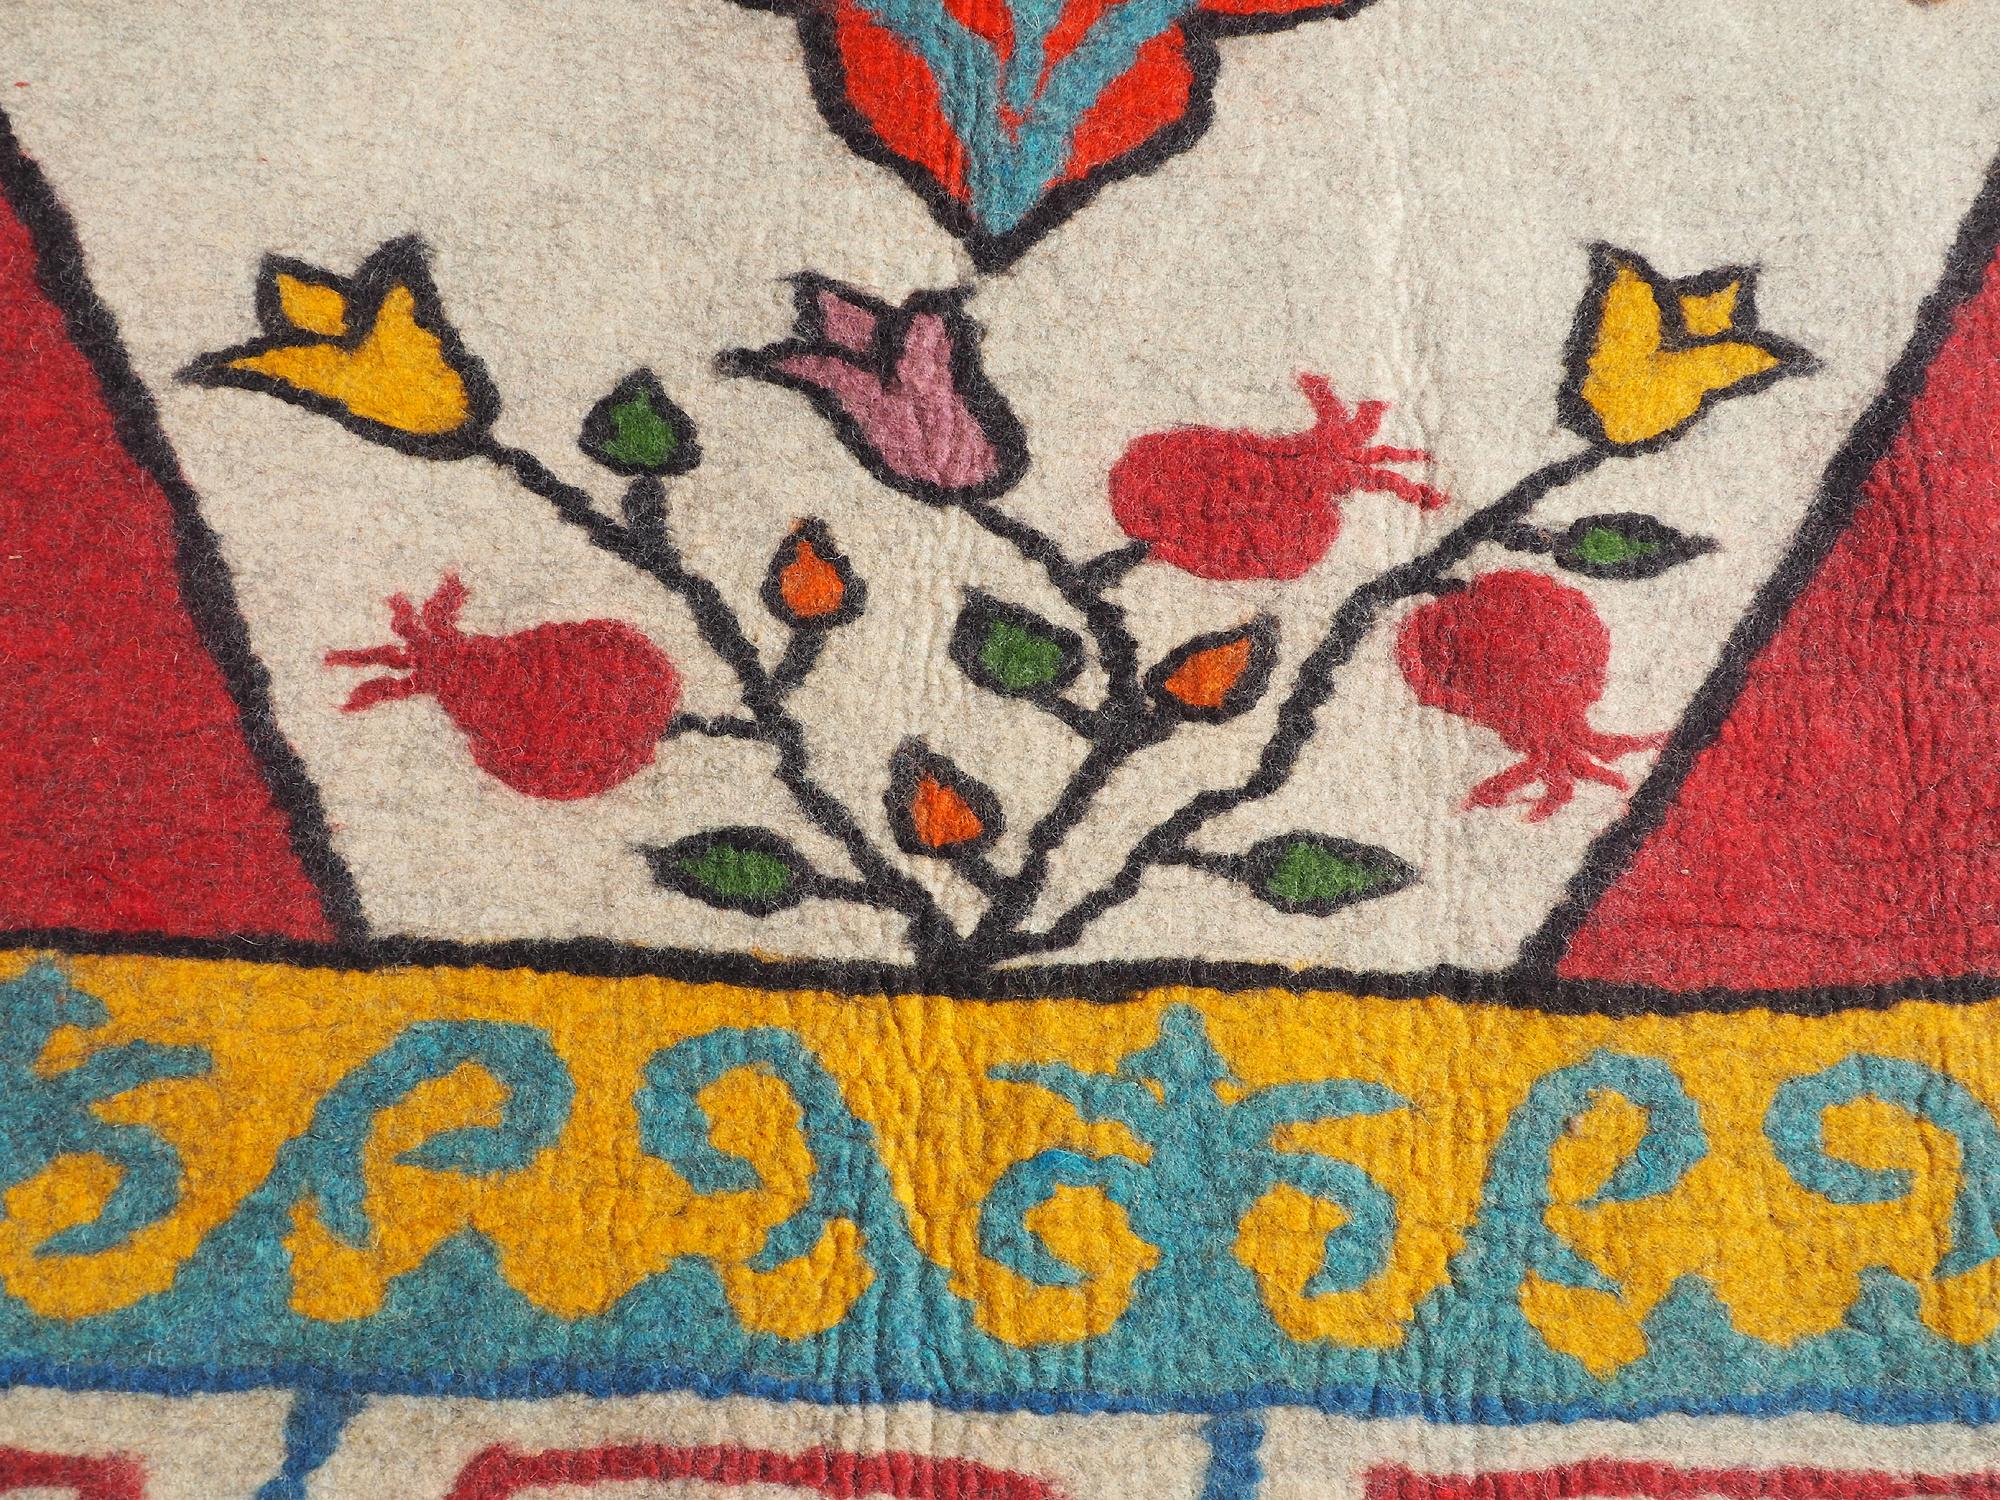 253x199 cm Oriental Tribal Turkmen nomad Handmade Felt Rug from Afghanistan No-705